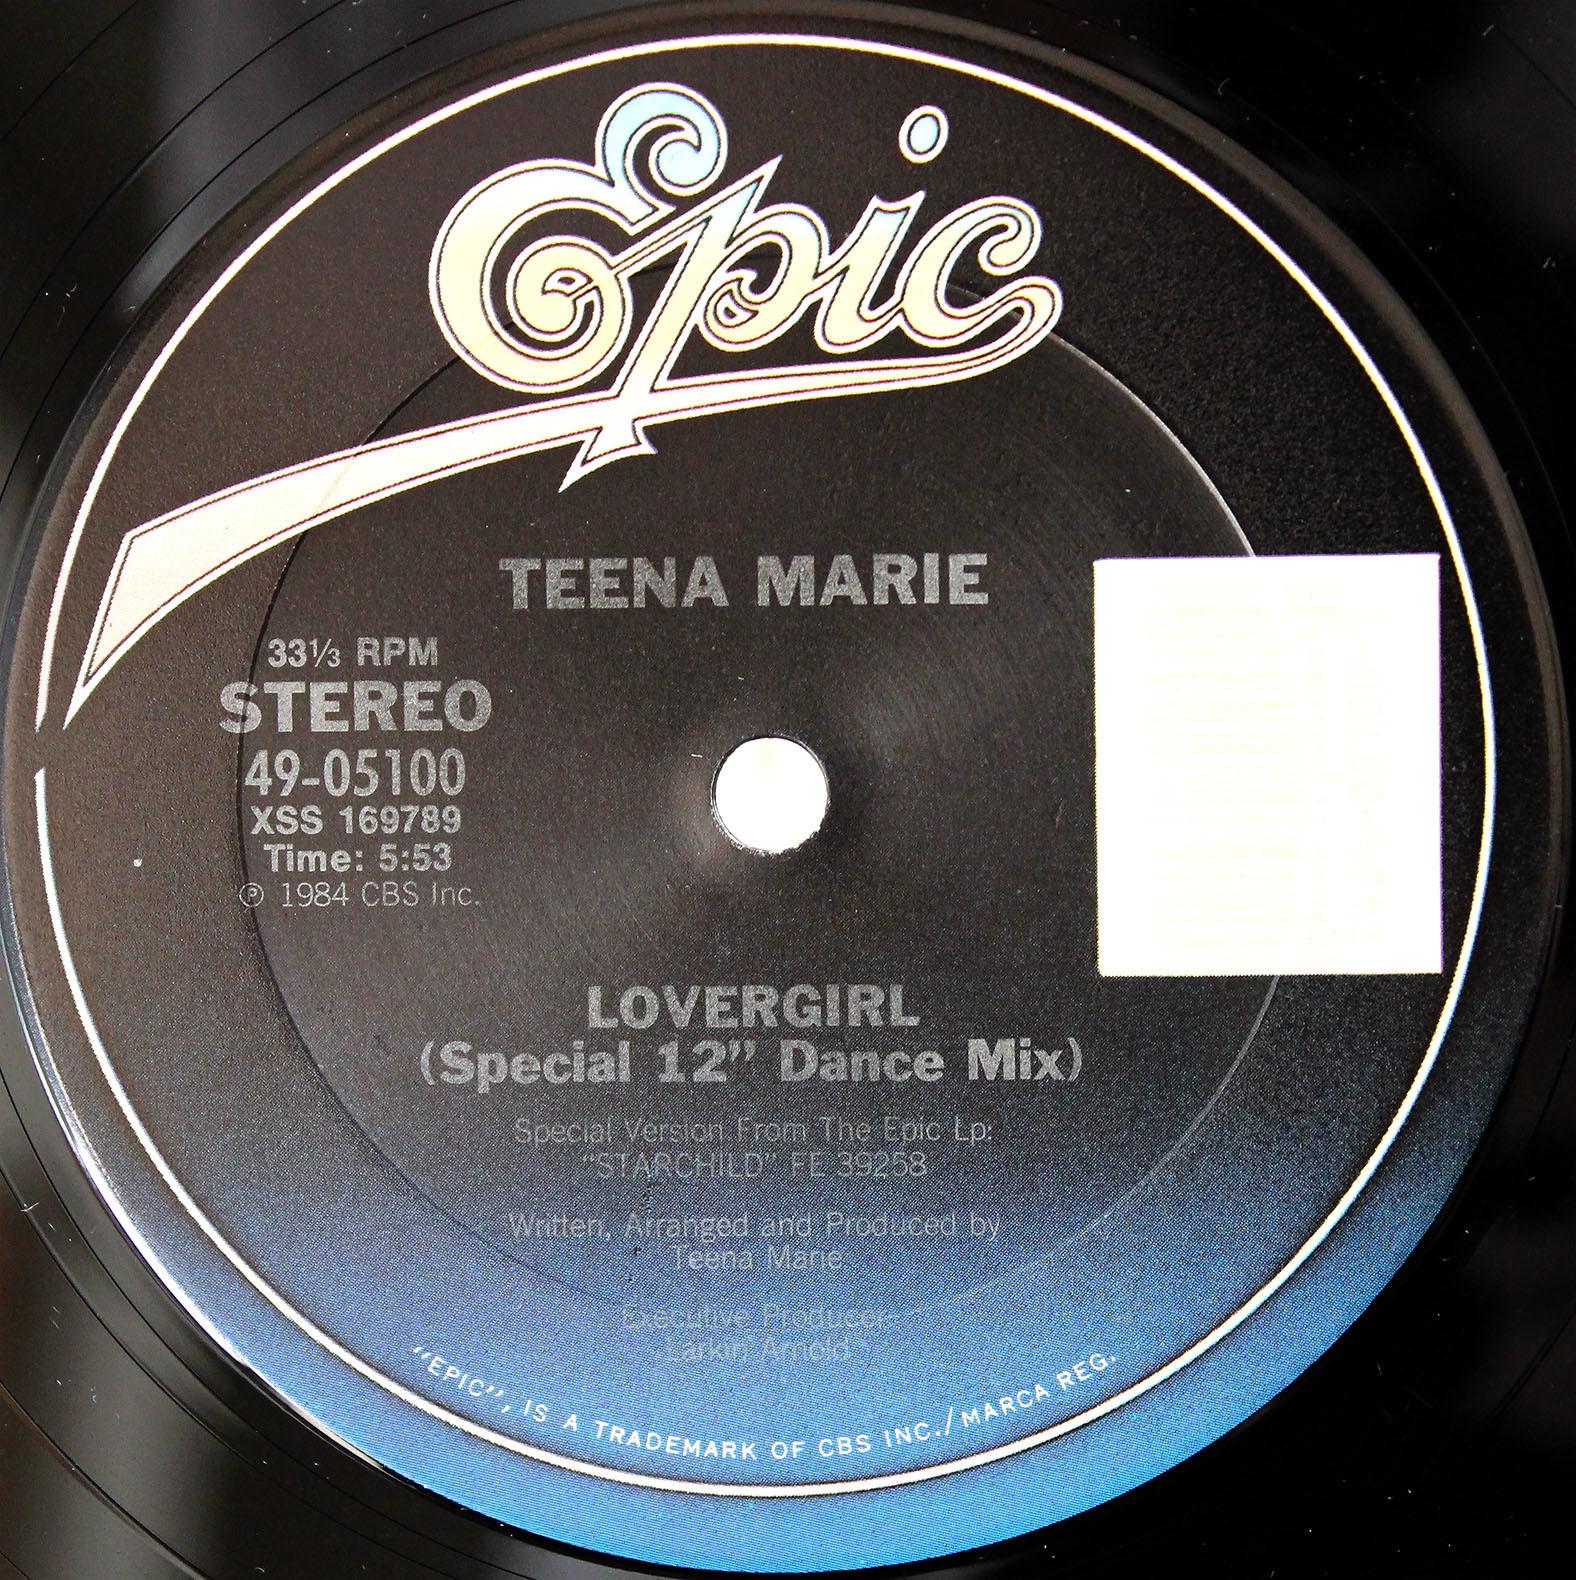 Teena Marie – Lovergirl 03